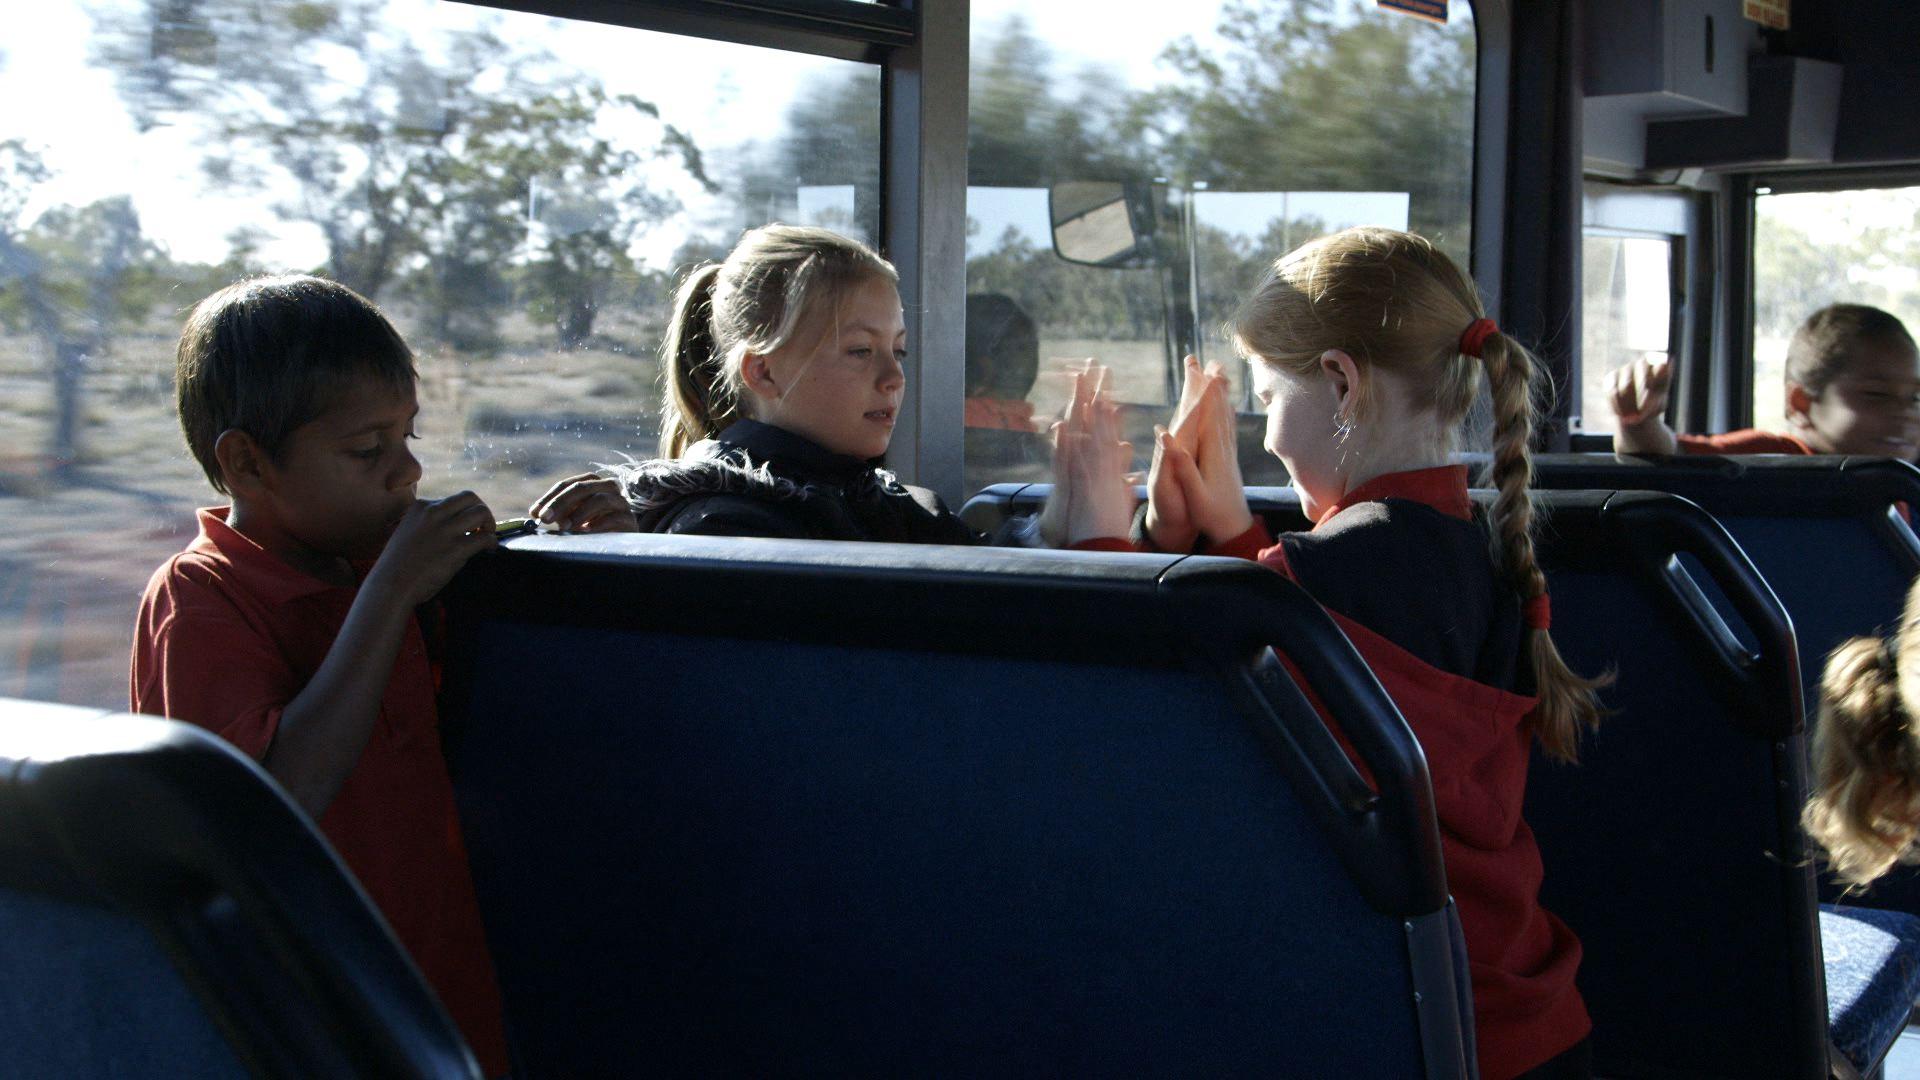 Opal on the bus